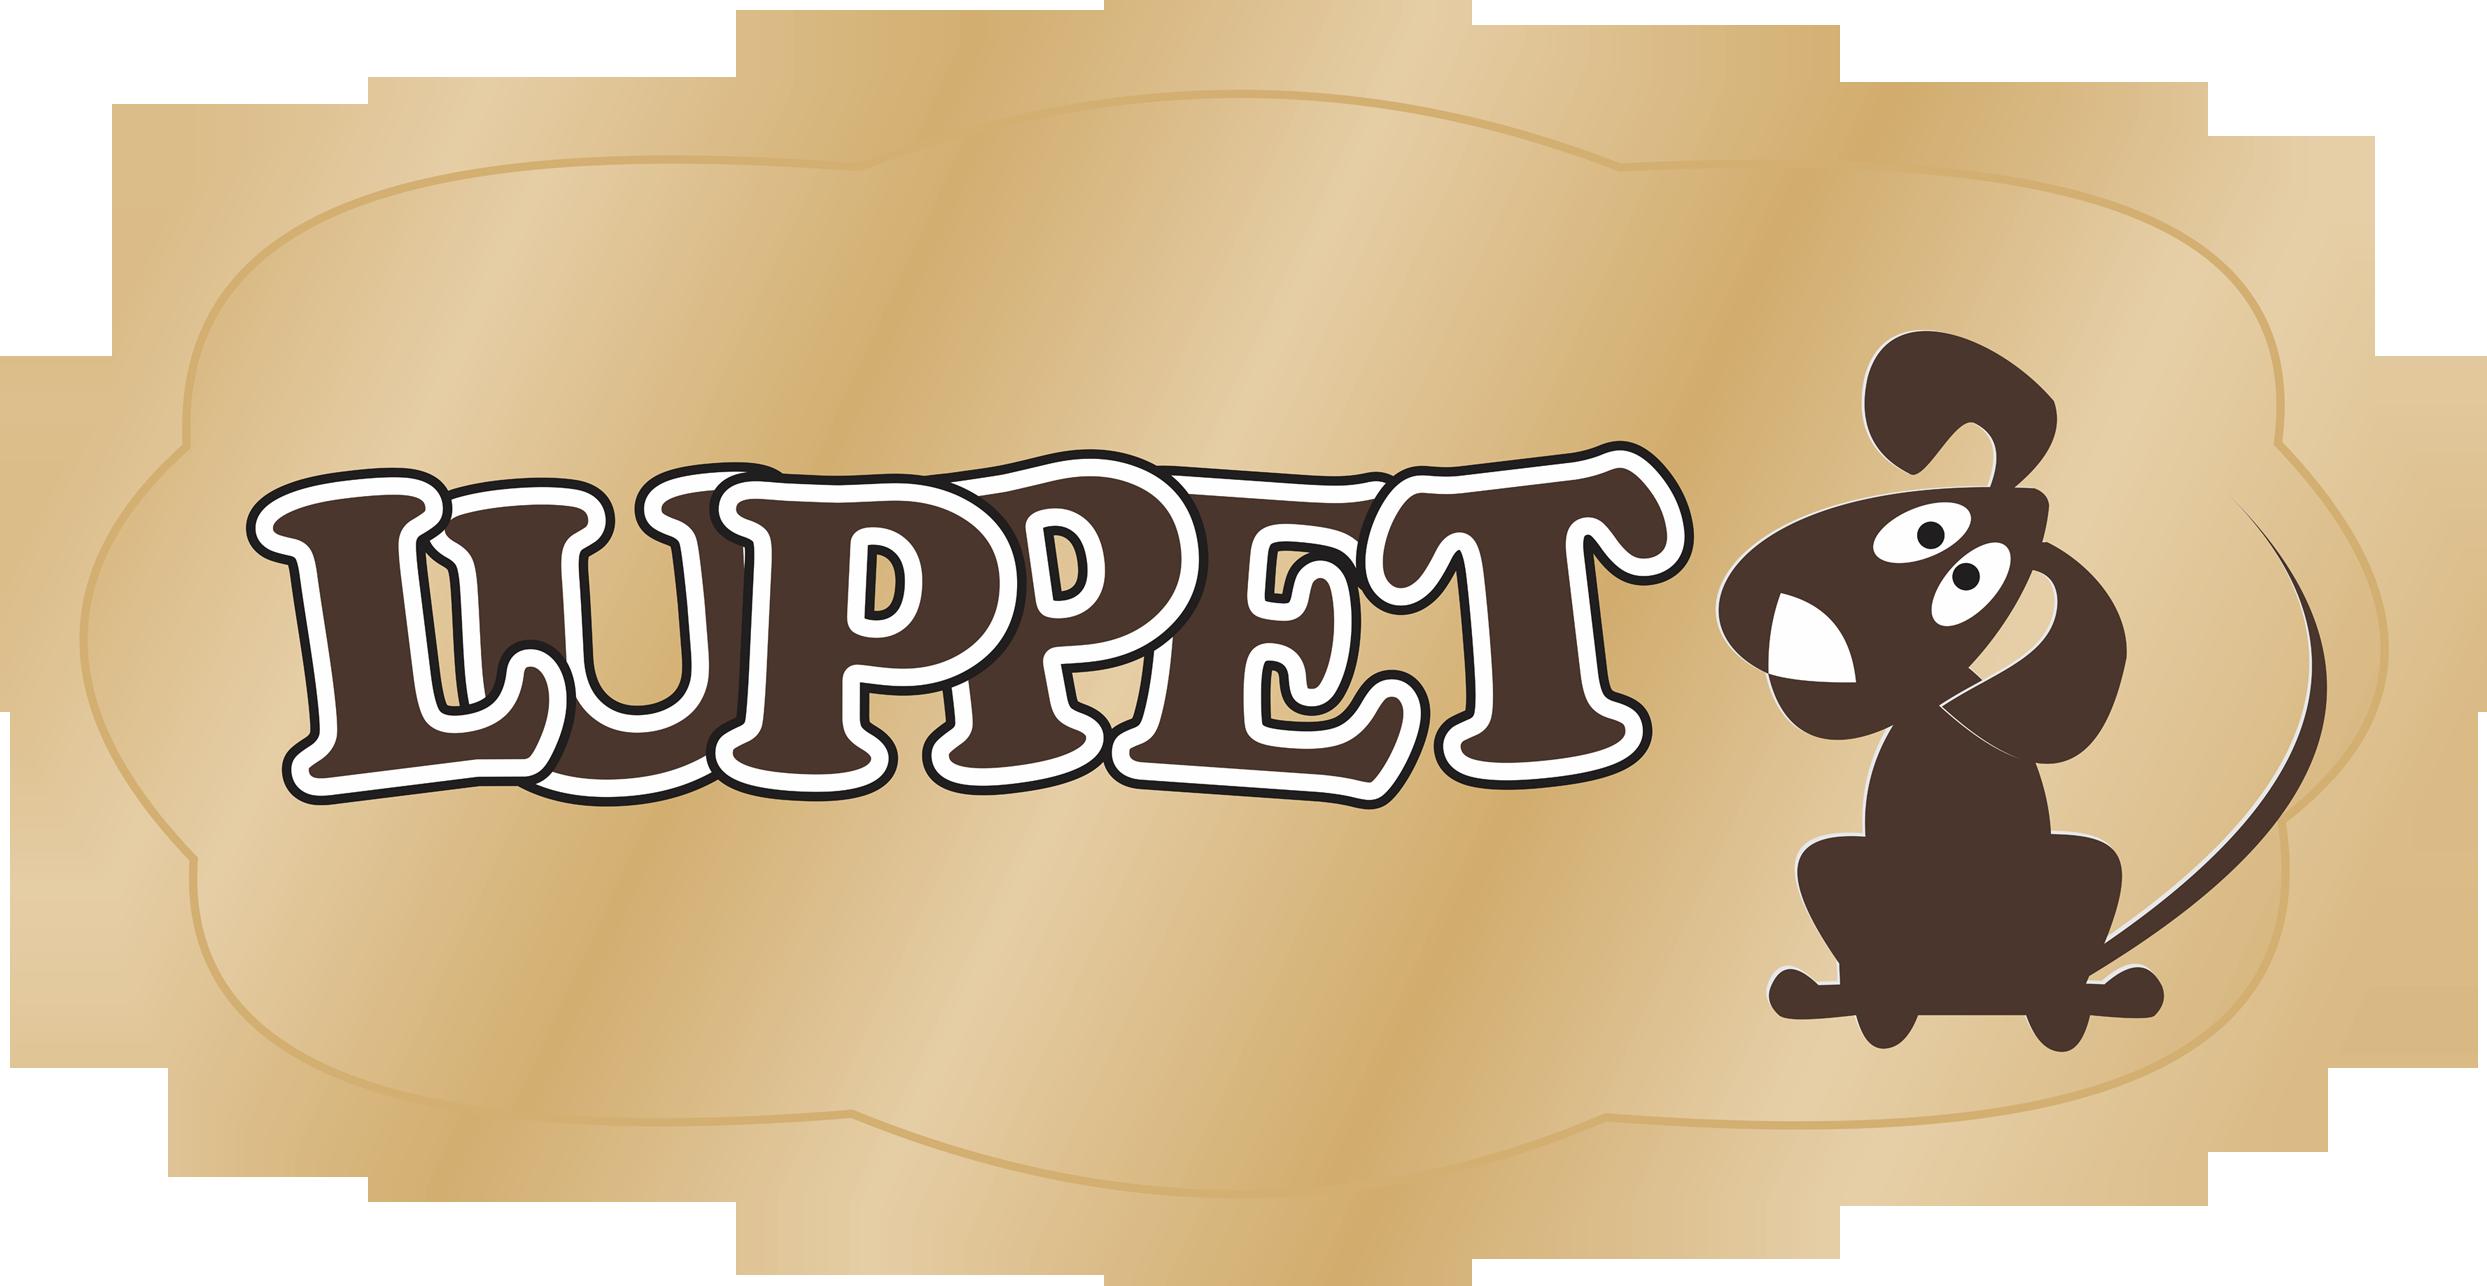 luppet logo marca nova